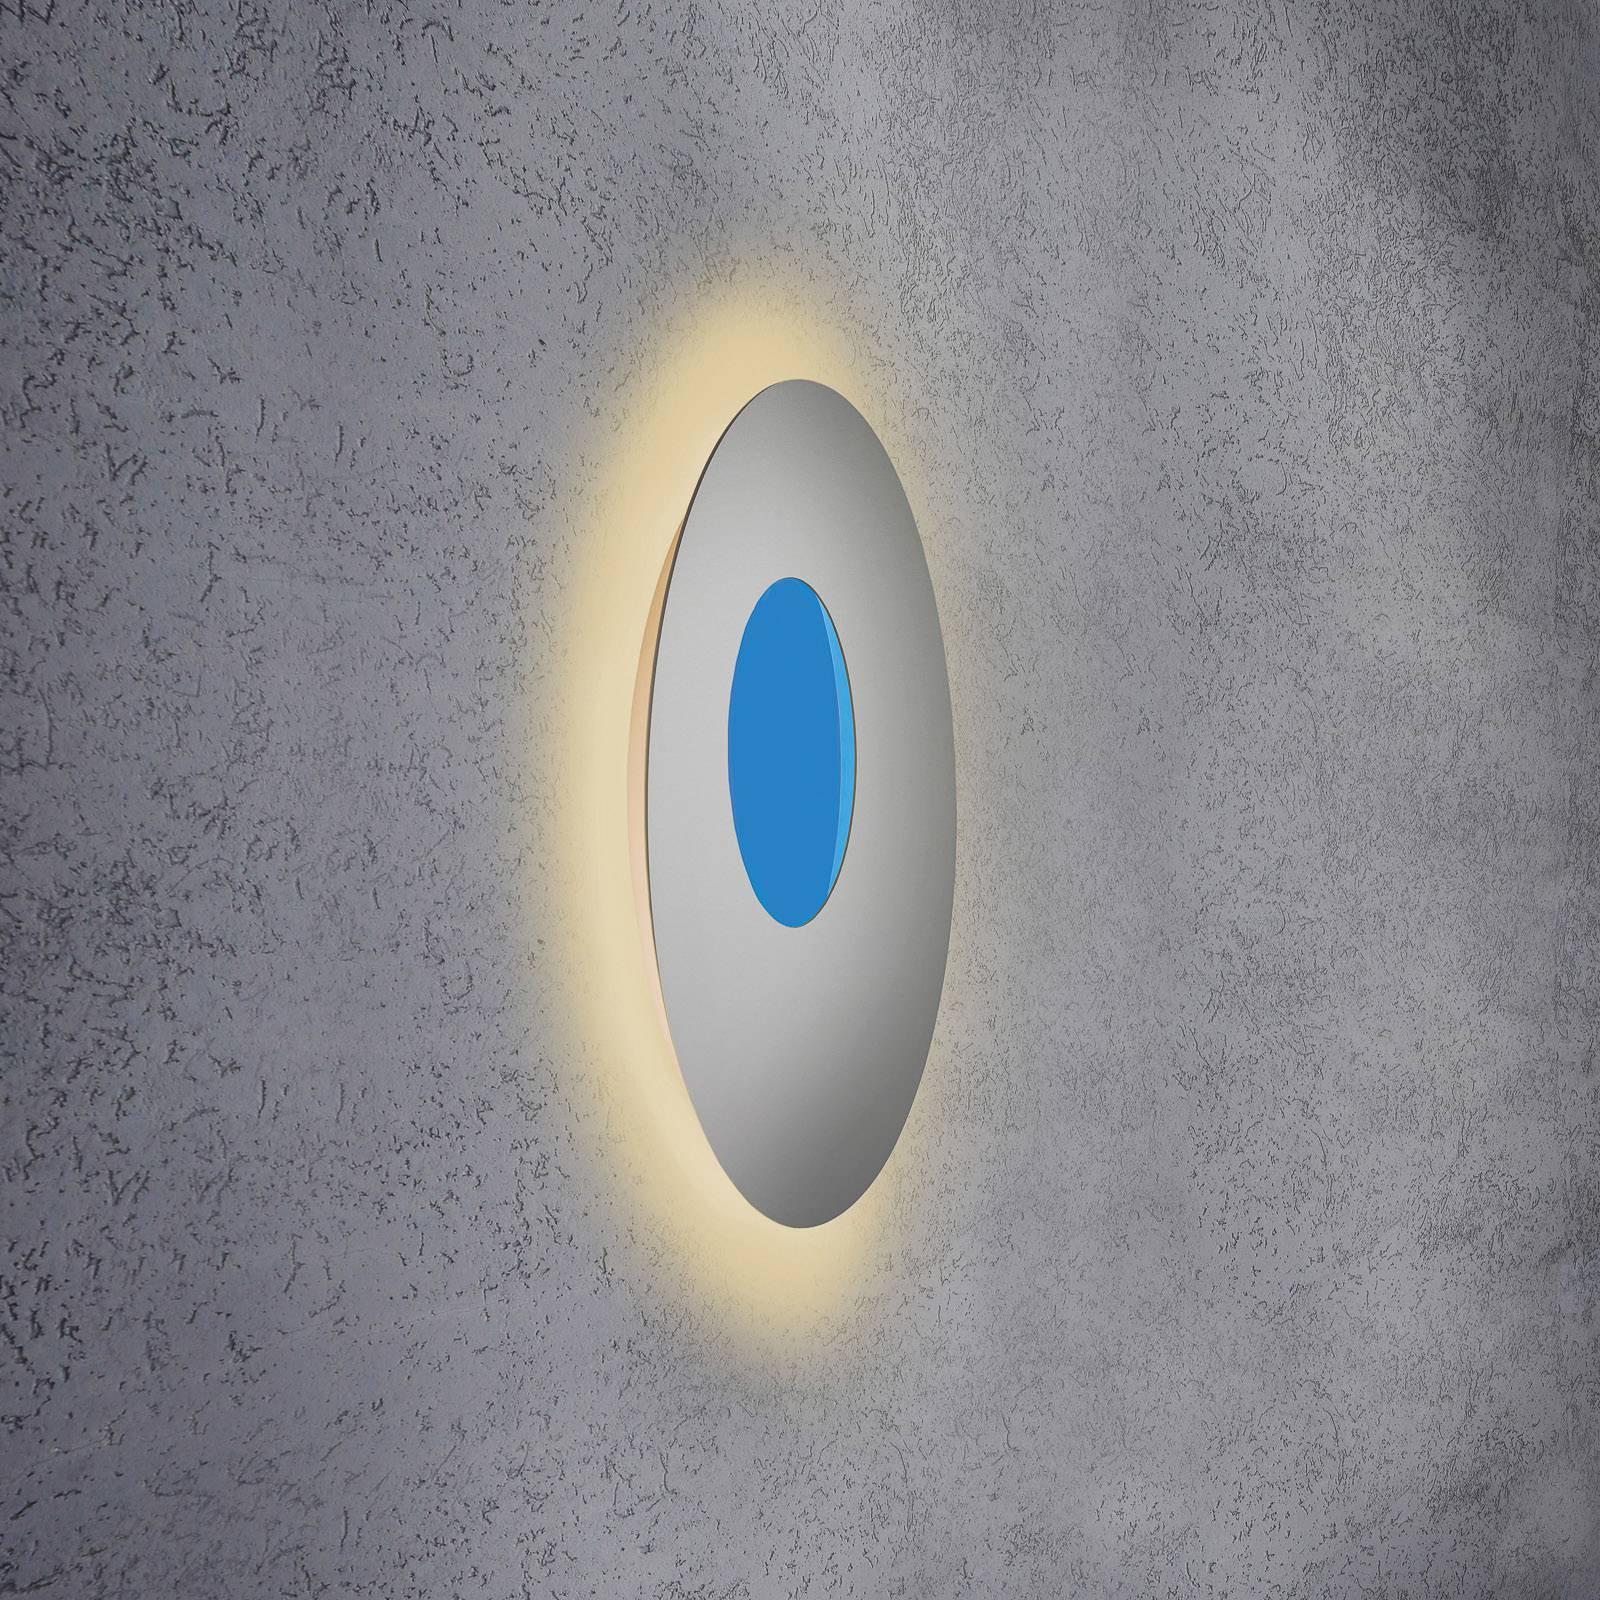 Escale Blade Open LED-vegglampe RGB+W, sølv, Ø59cm